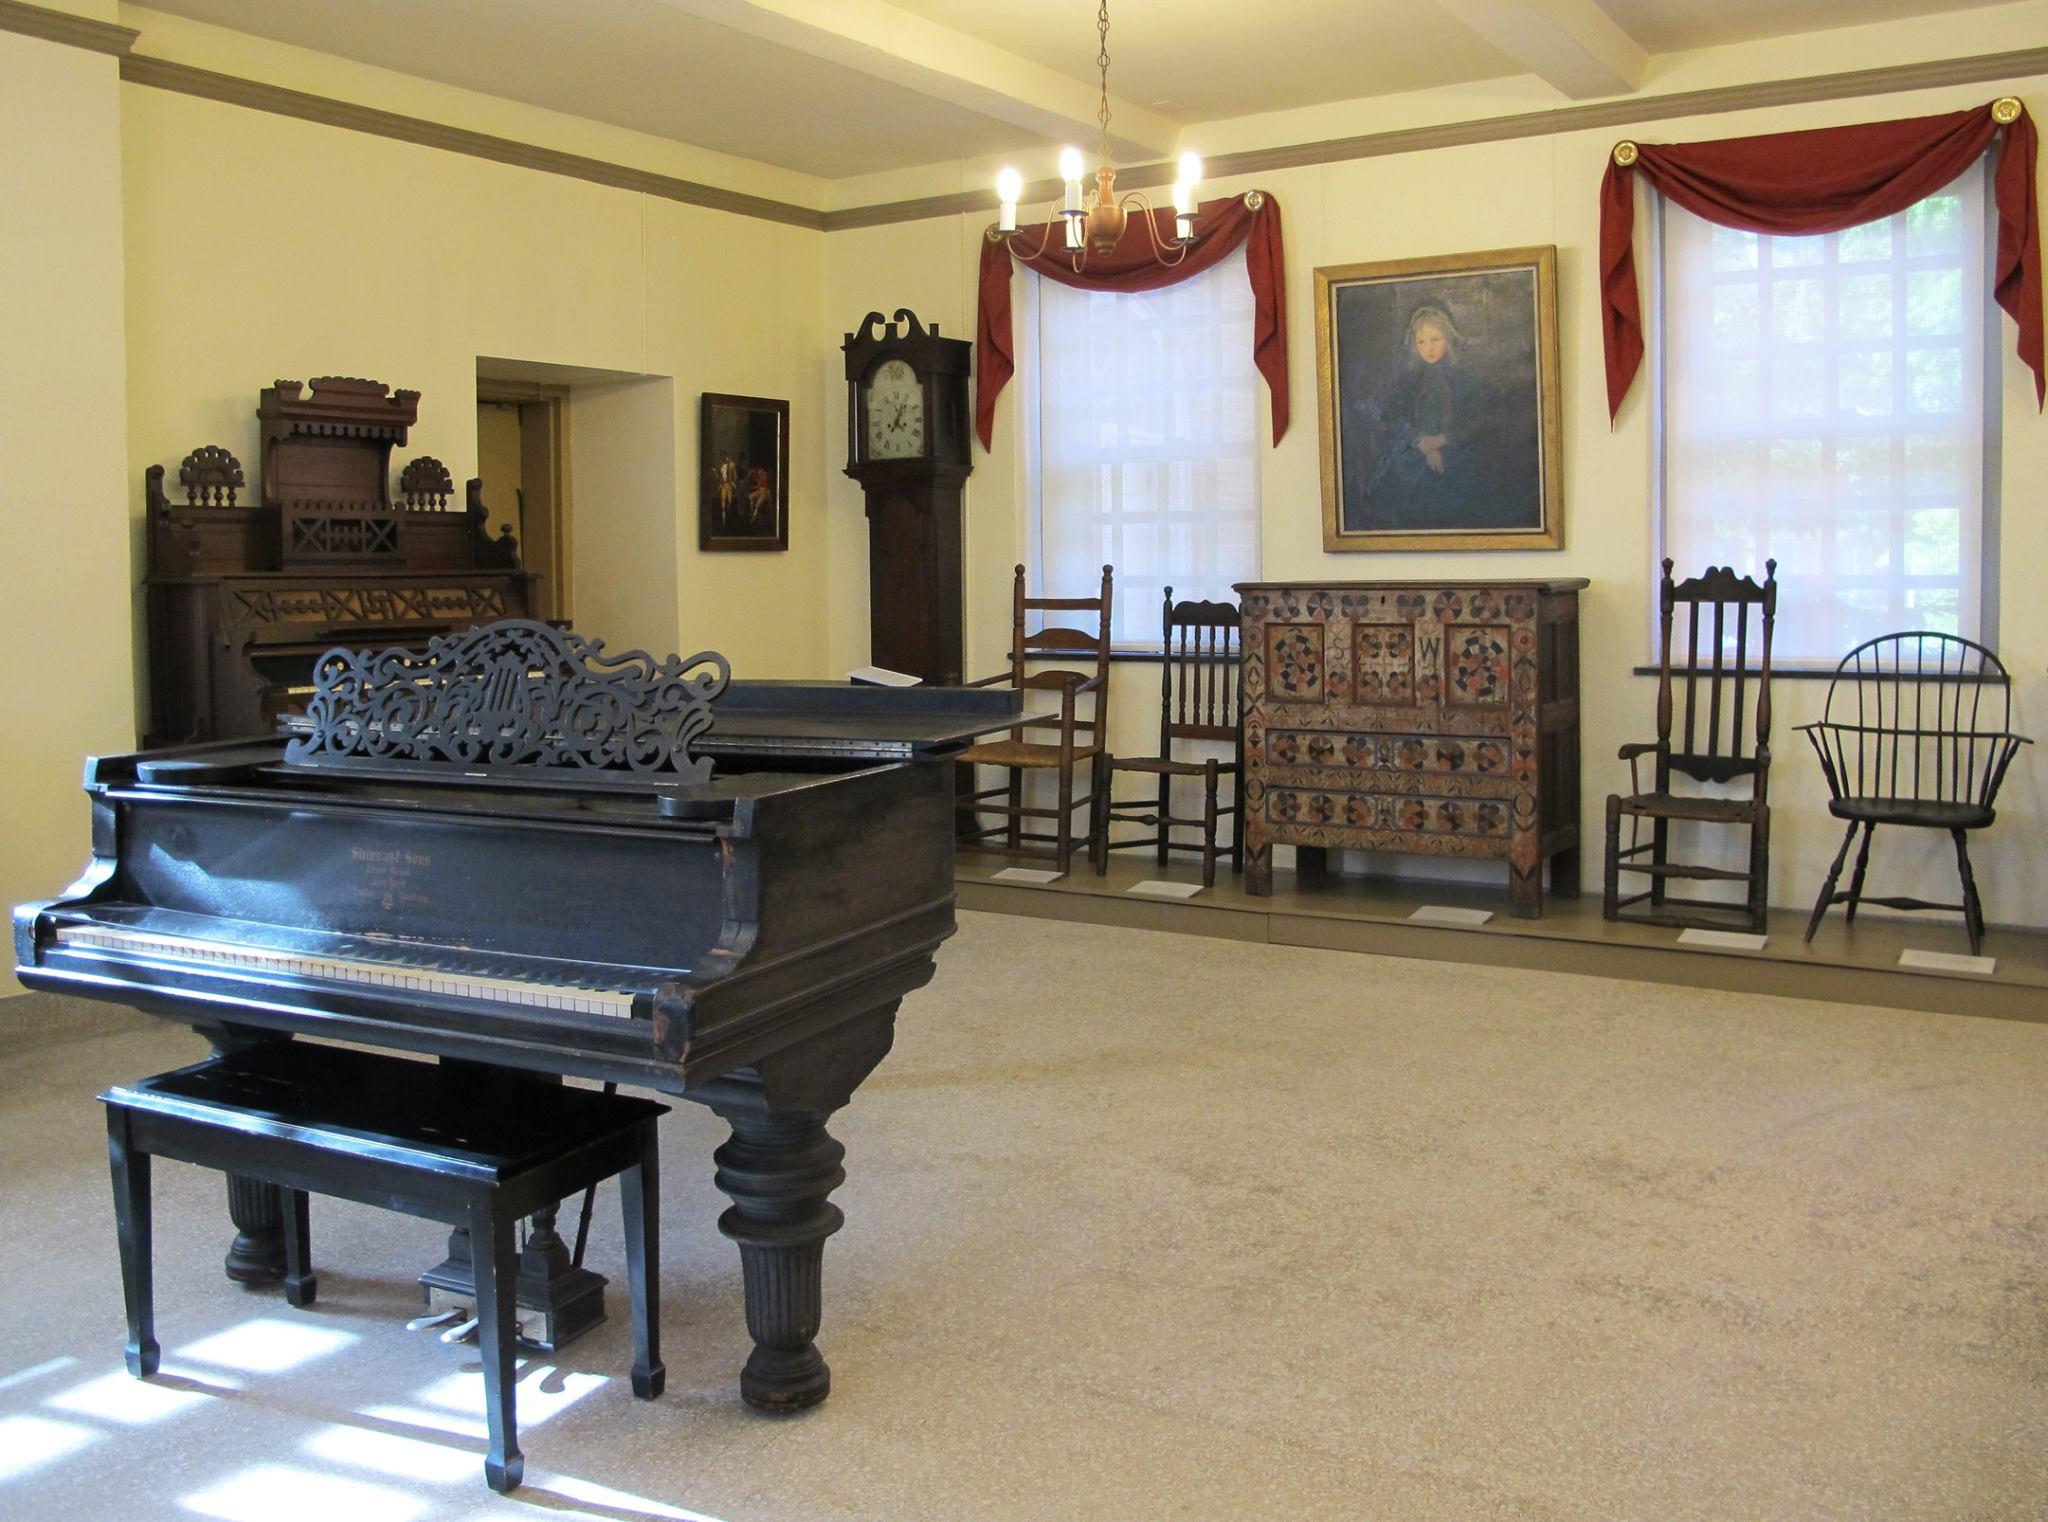 Memorial Hall's Music Room at PVMA, Old Deerfield MA